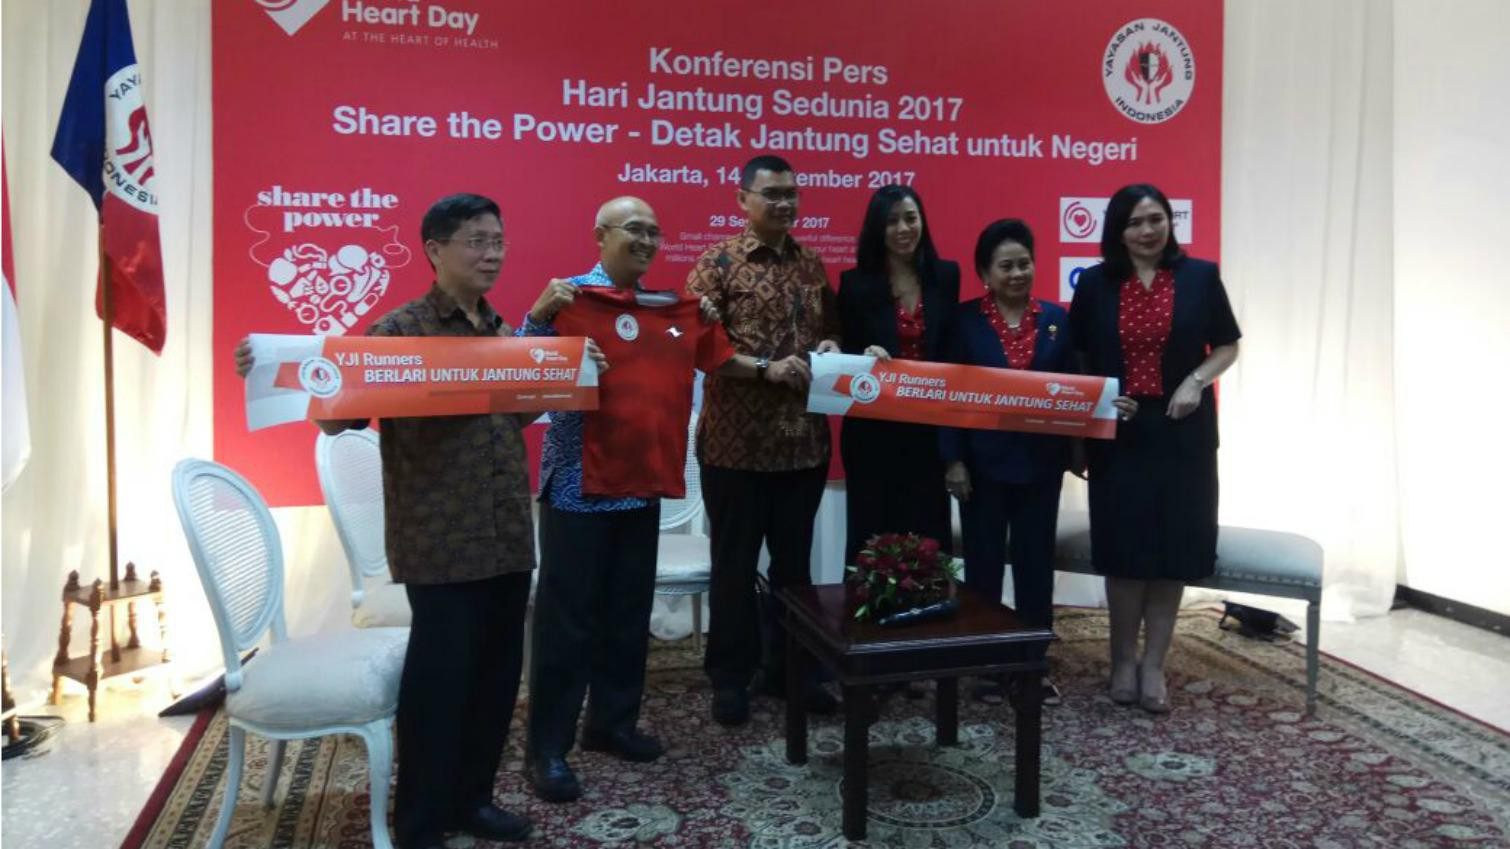 Hari Jantung Sedunia, Yayasan Jantung Indonesia Ajak